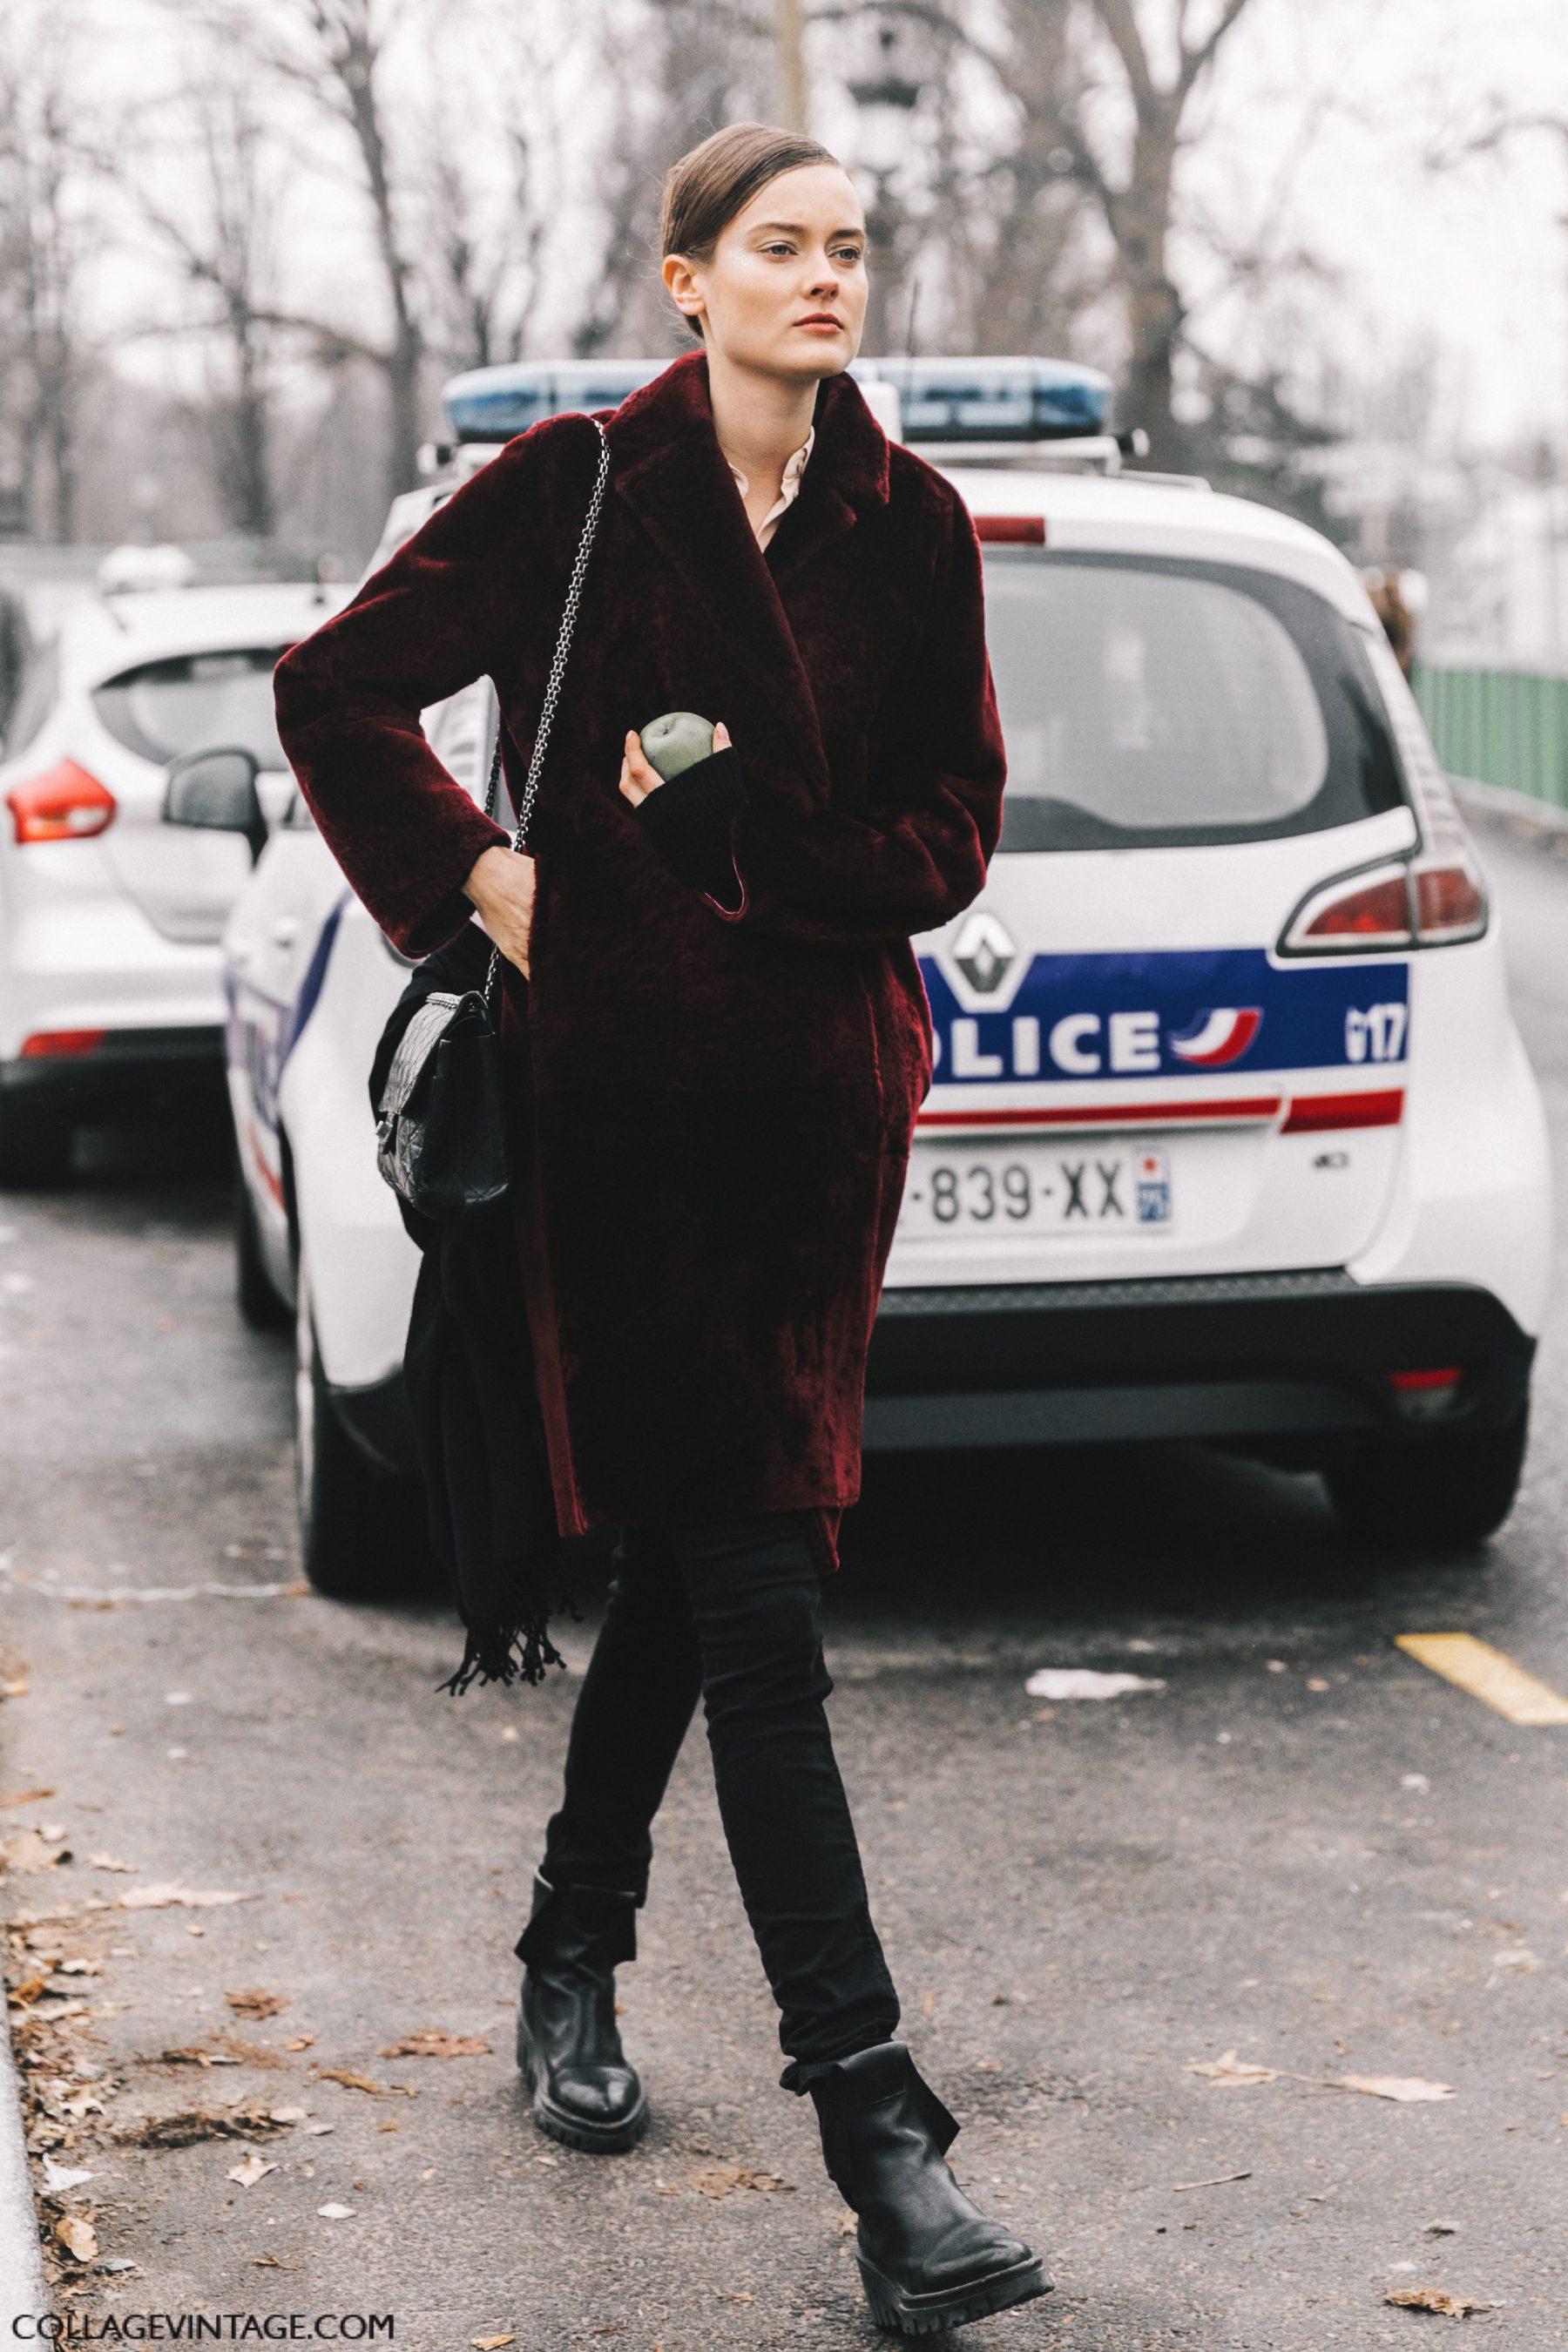 Blackfashion Blog Facebook Puksies Wardrobe Tumblr: Street Style Paris Couture II